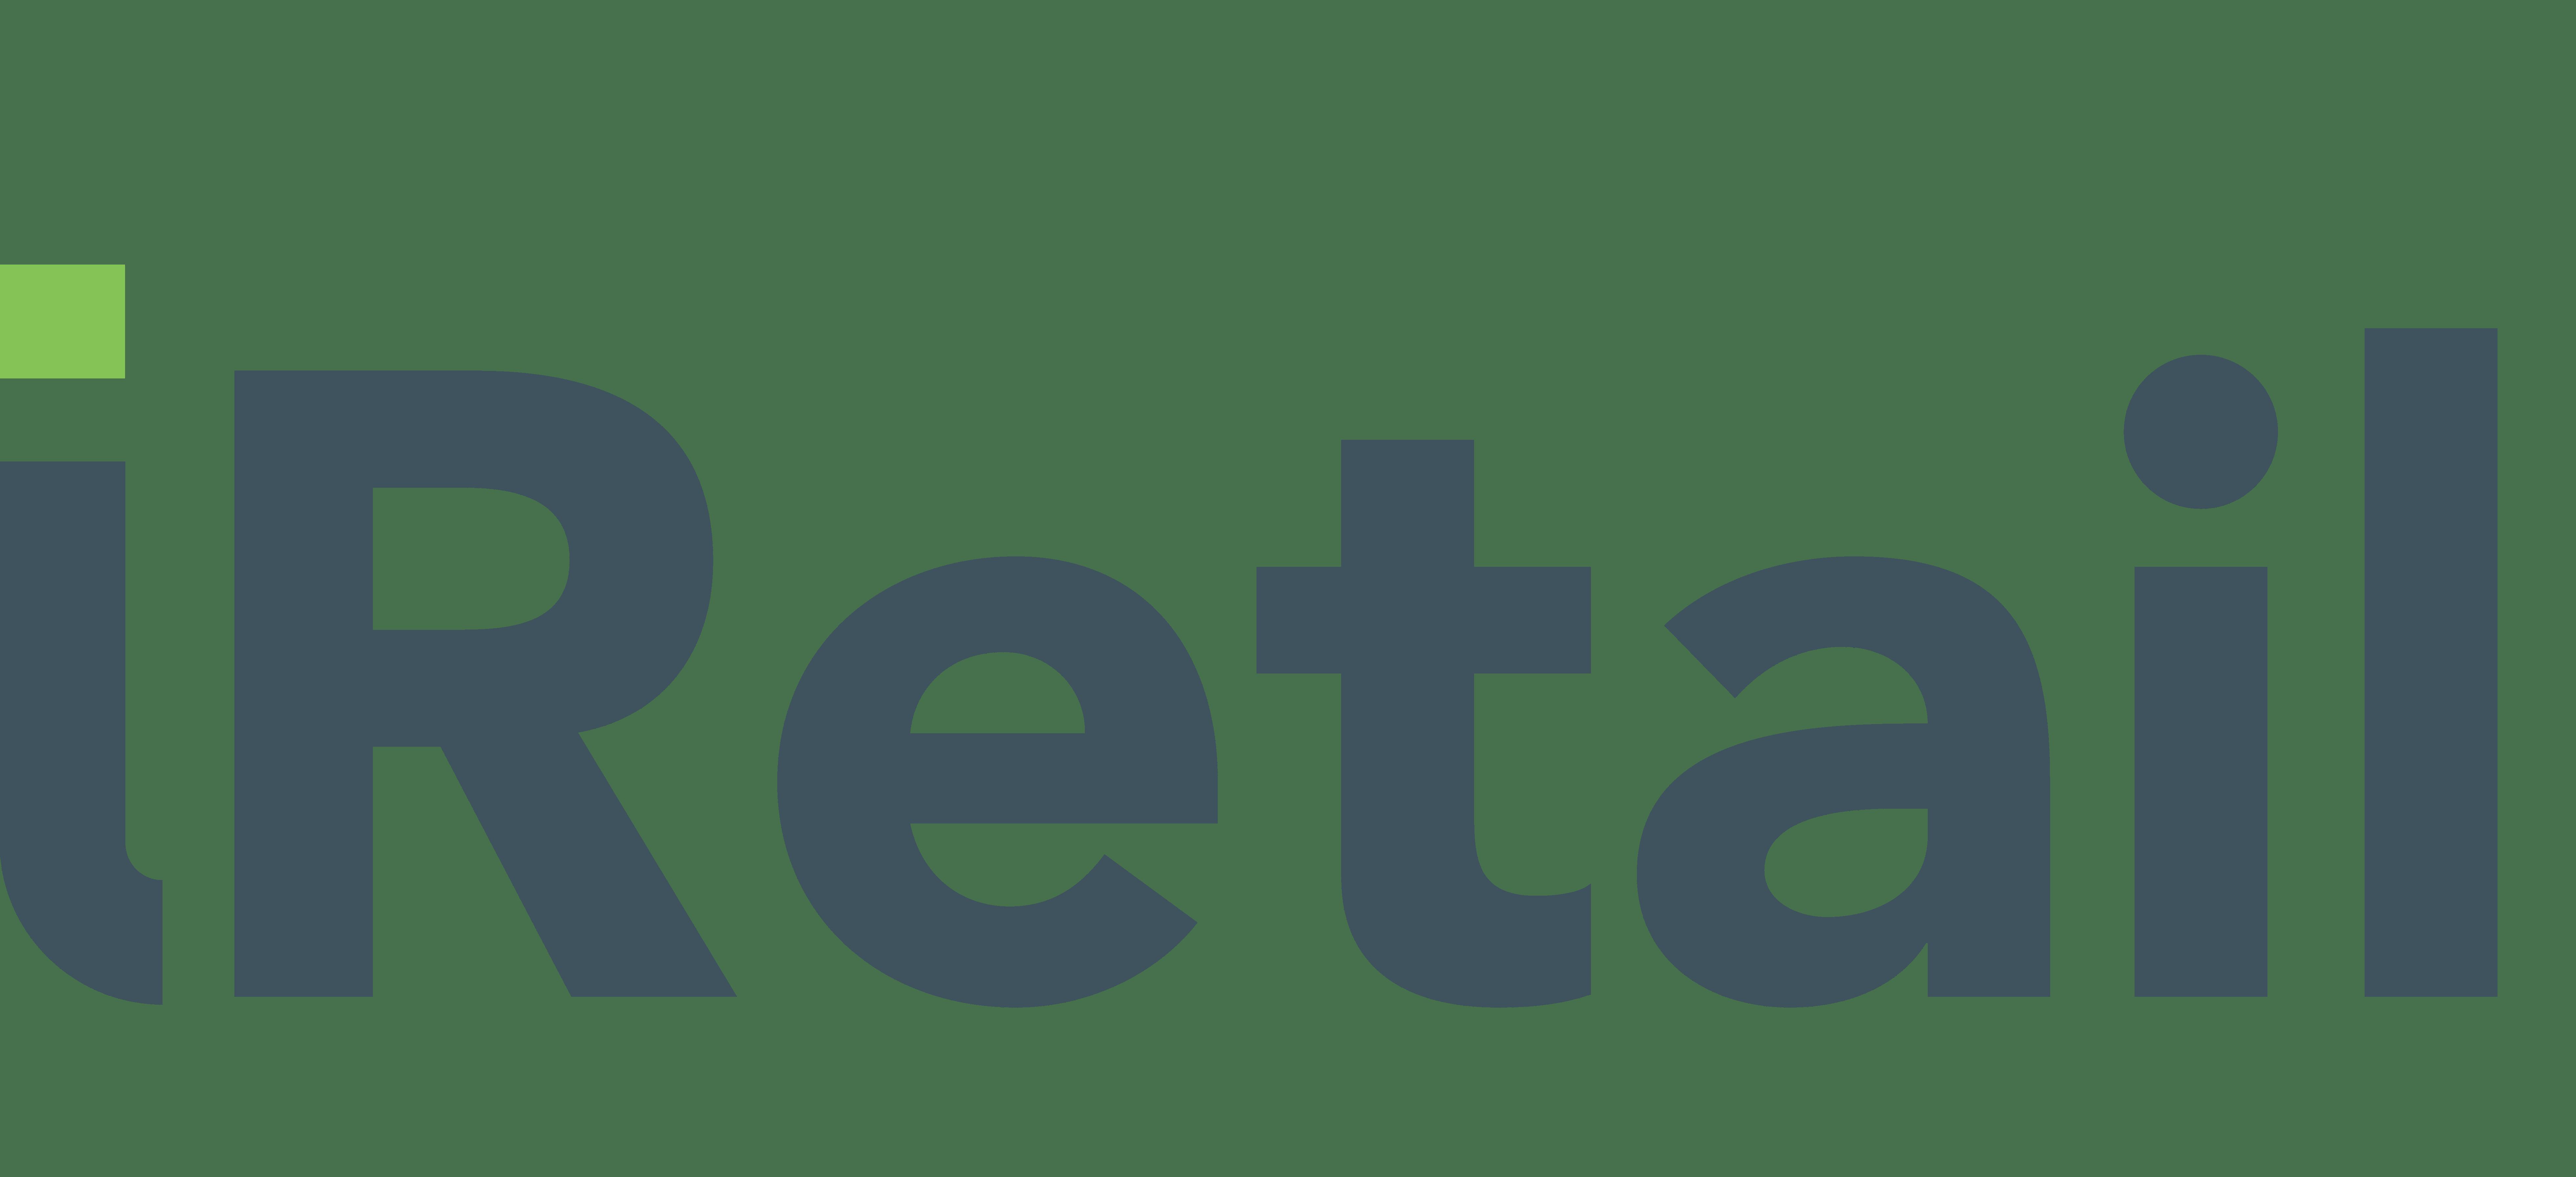 logo iretail iprospect